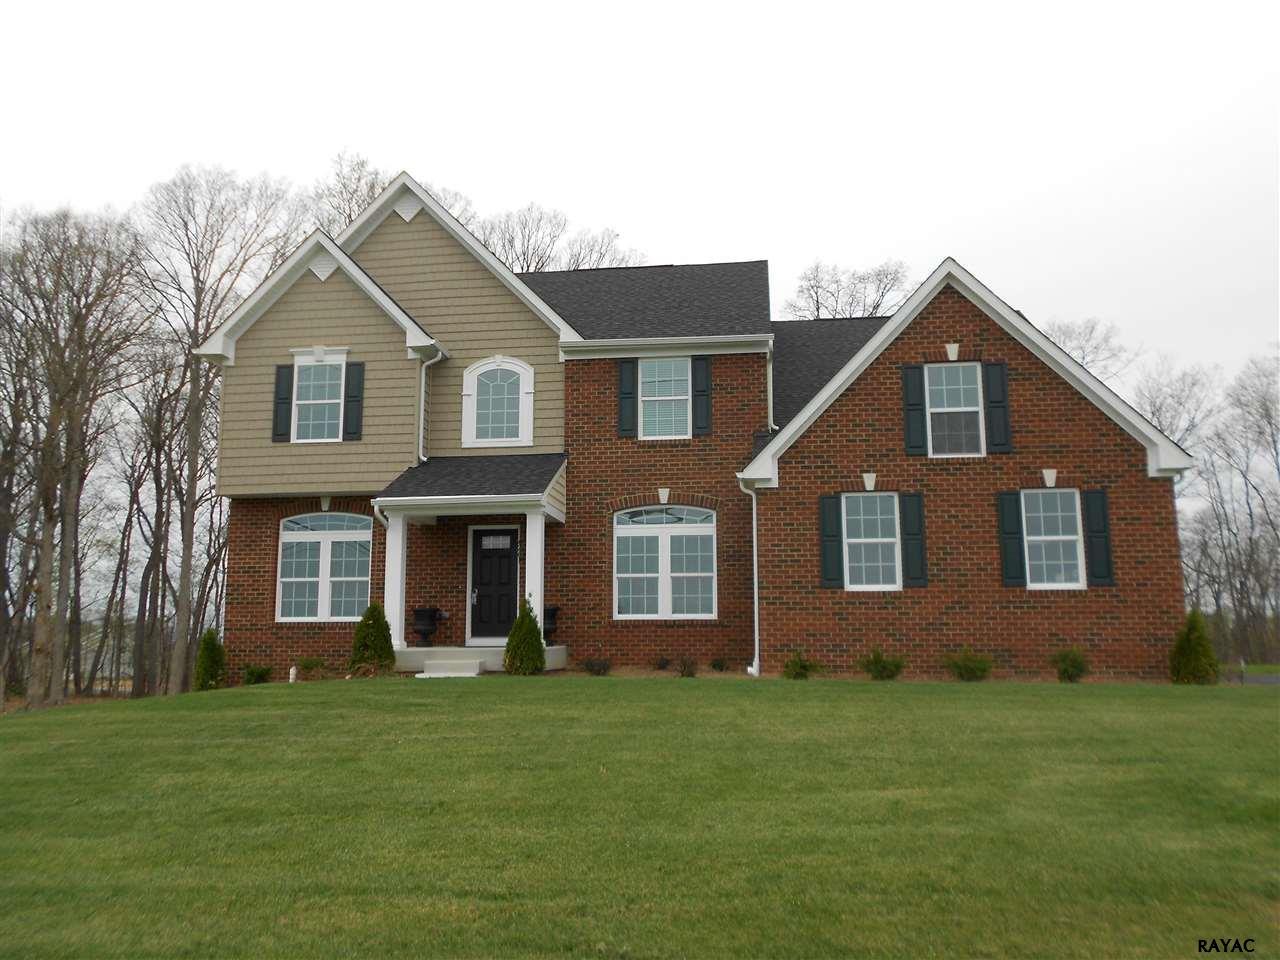 4261 Grandview Rd, Hanover, PA 17331